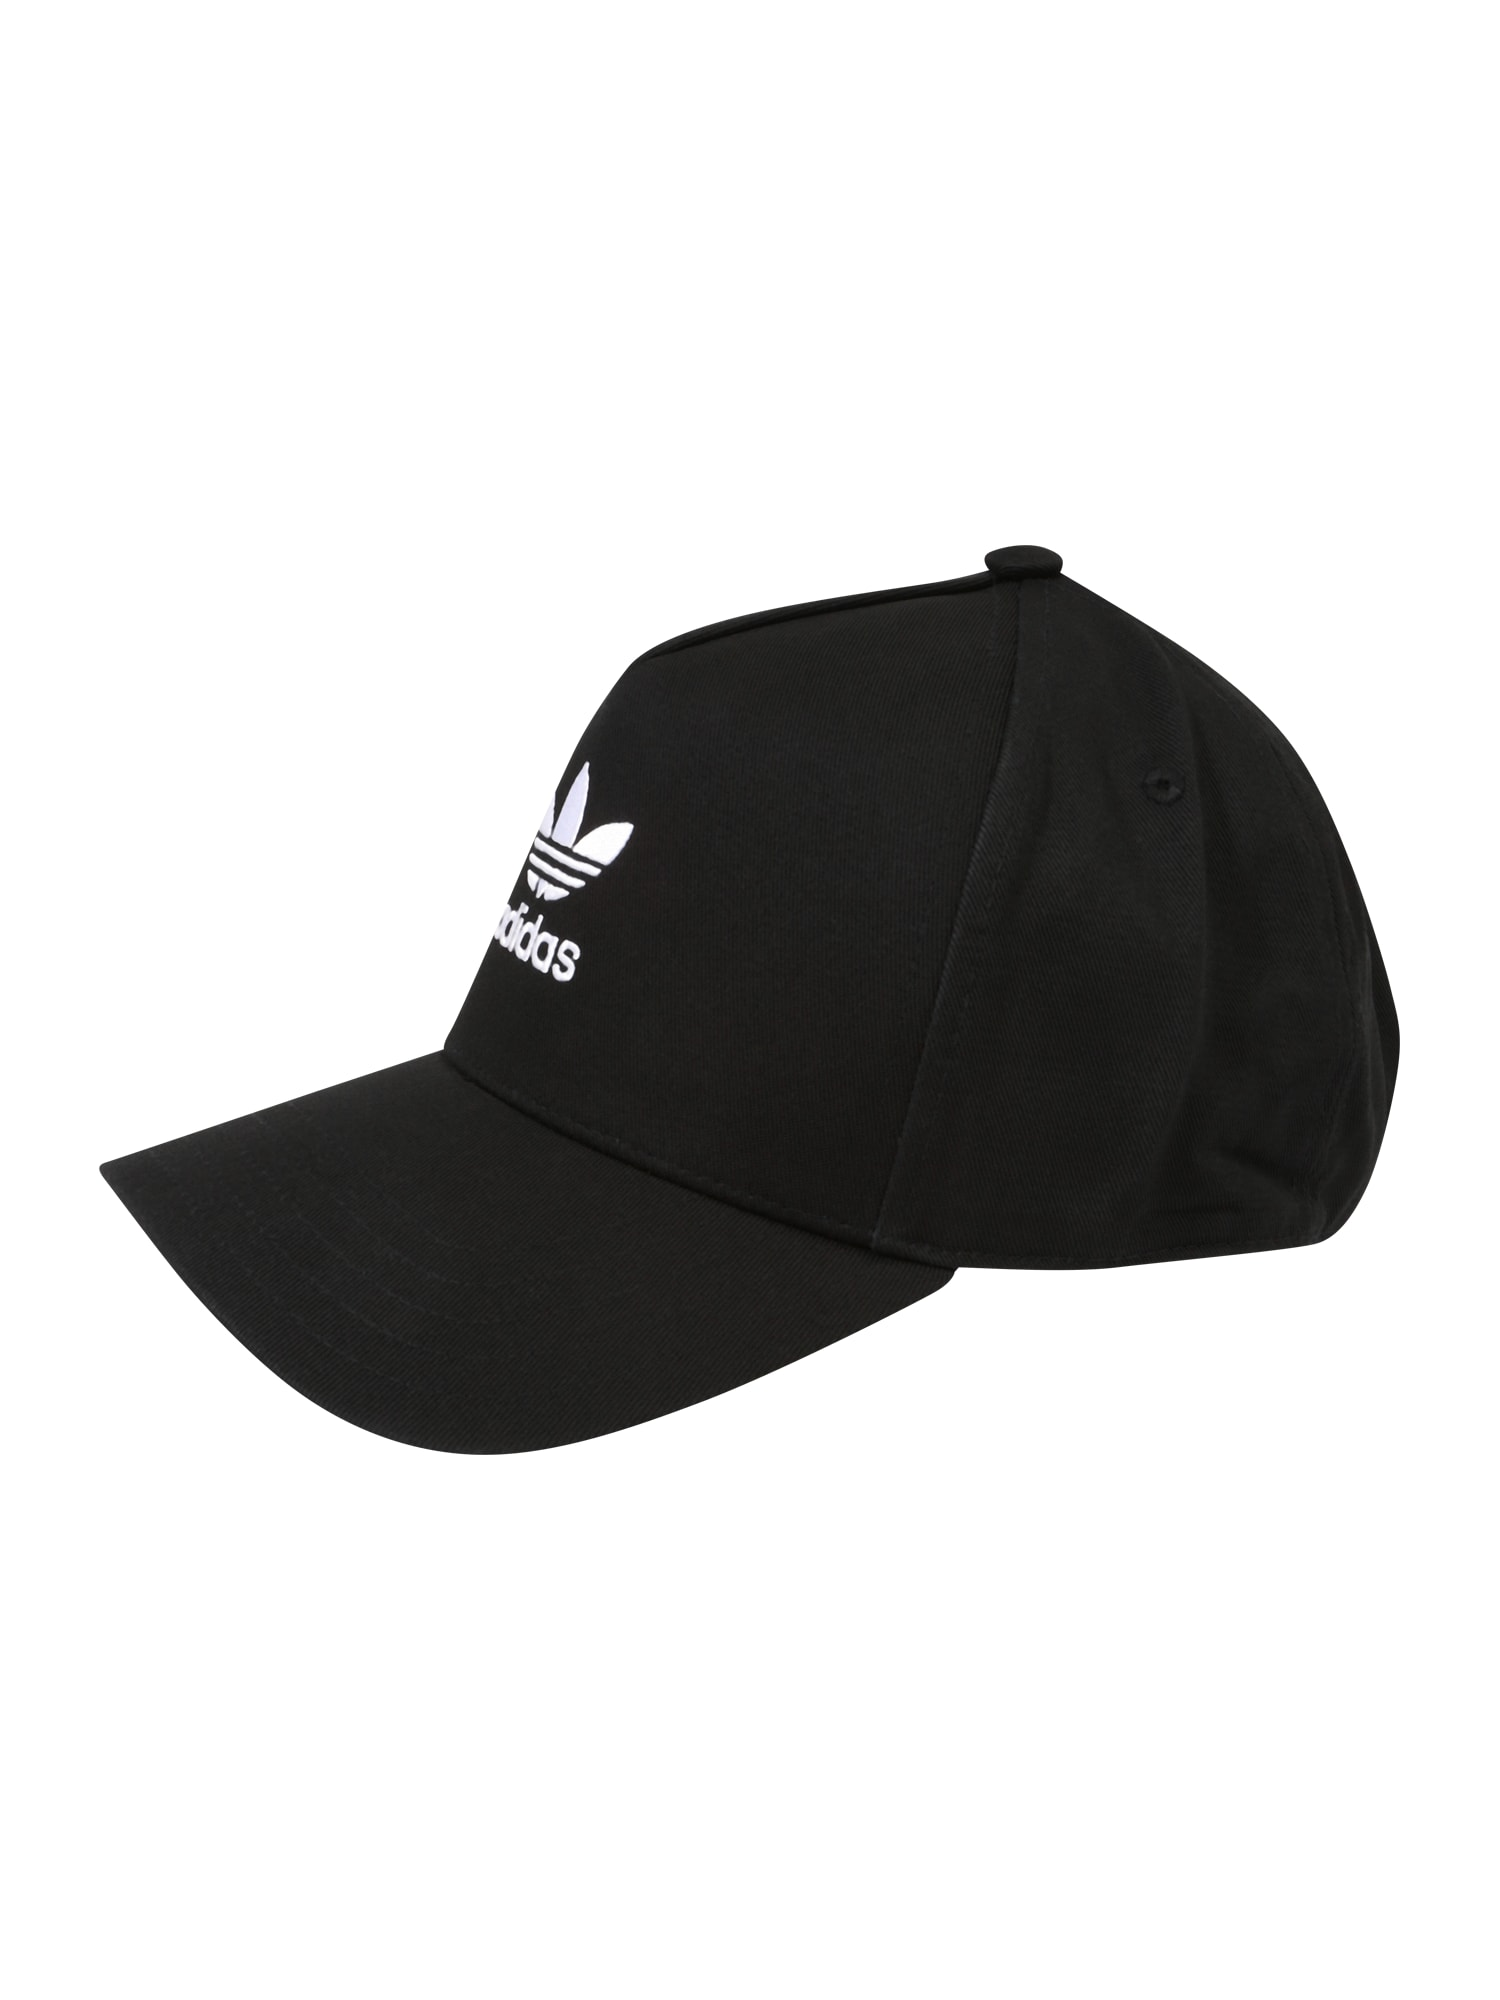 ADIDAS ORIGINALS Kepurė juoda / balta